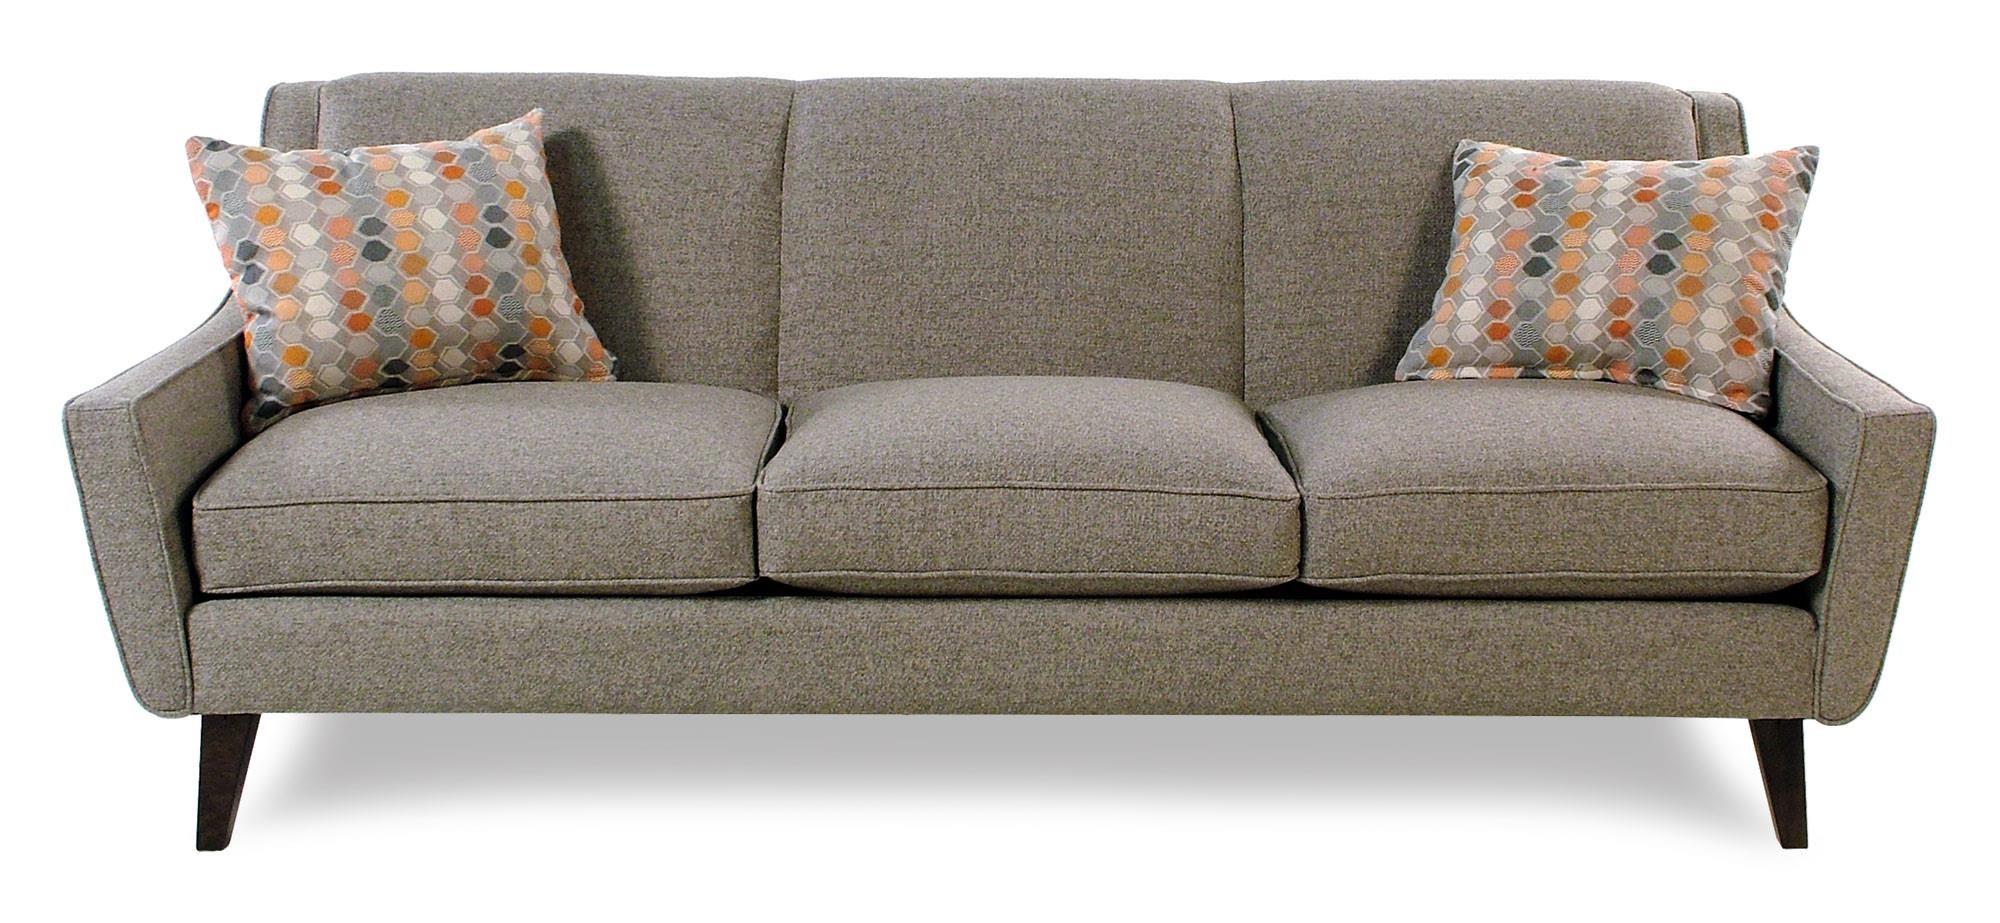 Cisco Vibe Mid-Century Modern Sofa - Item Number: 016-30-ASHEN